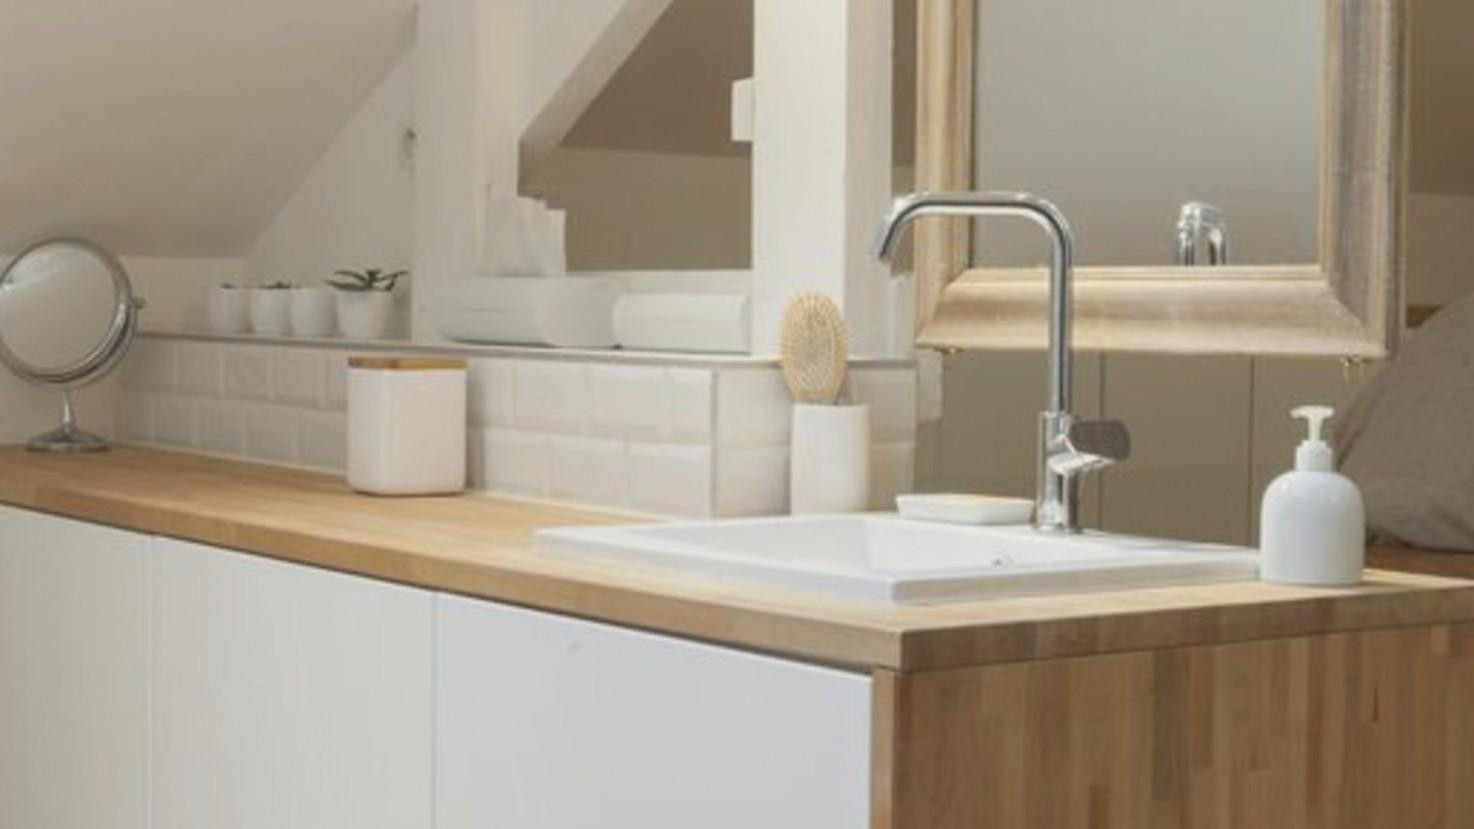 Plan de travail meuble vasque - pearlfection.fr